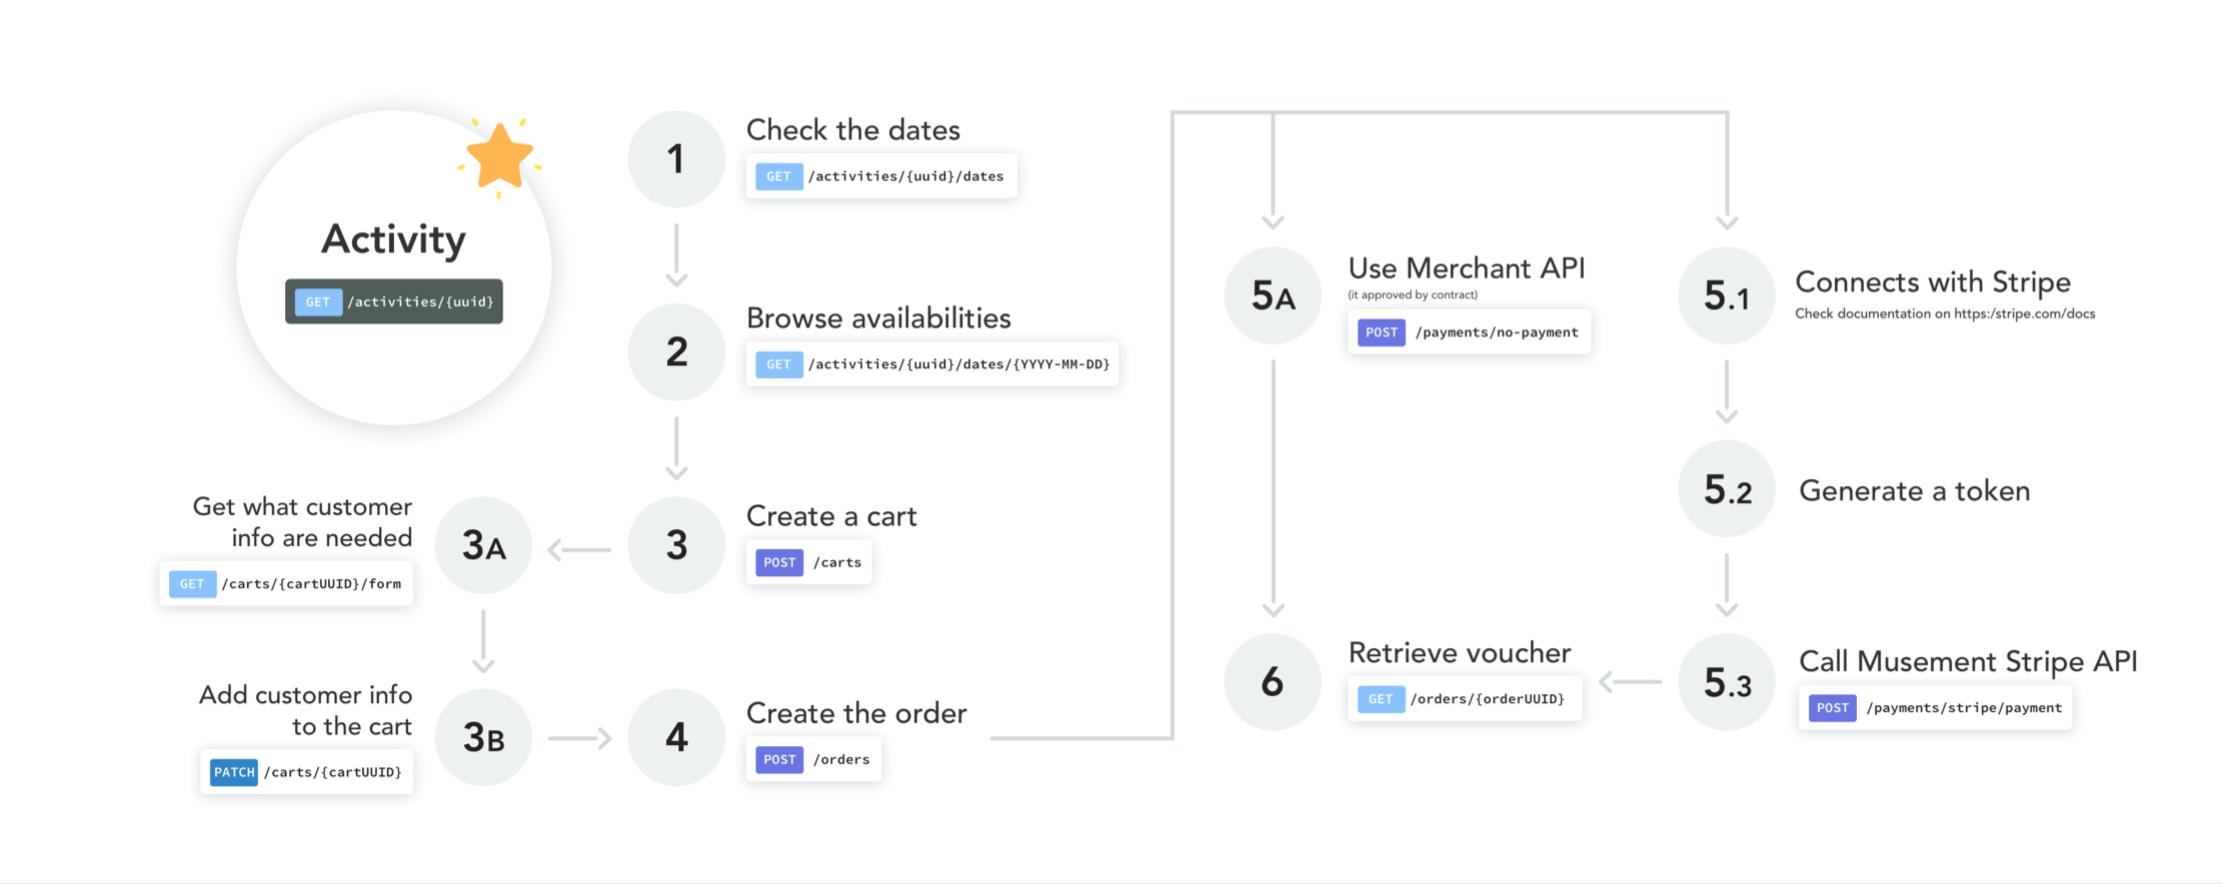 Full integration flow, from Catalog to transaction generation